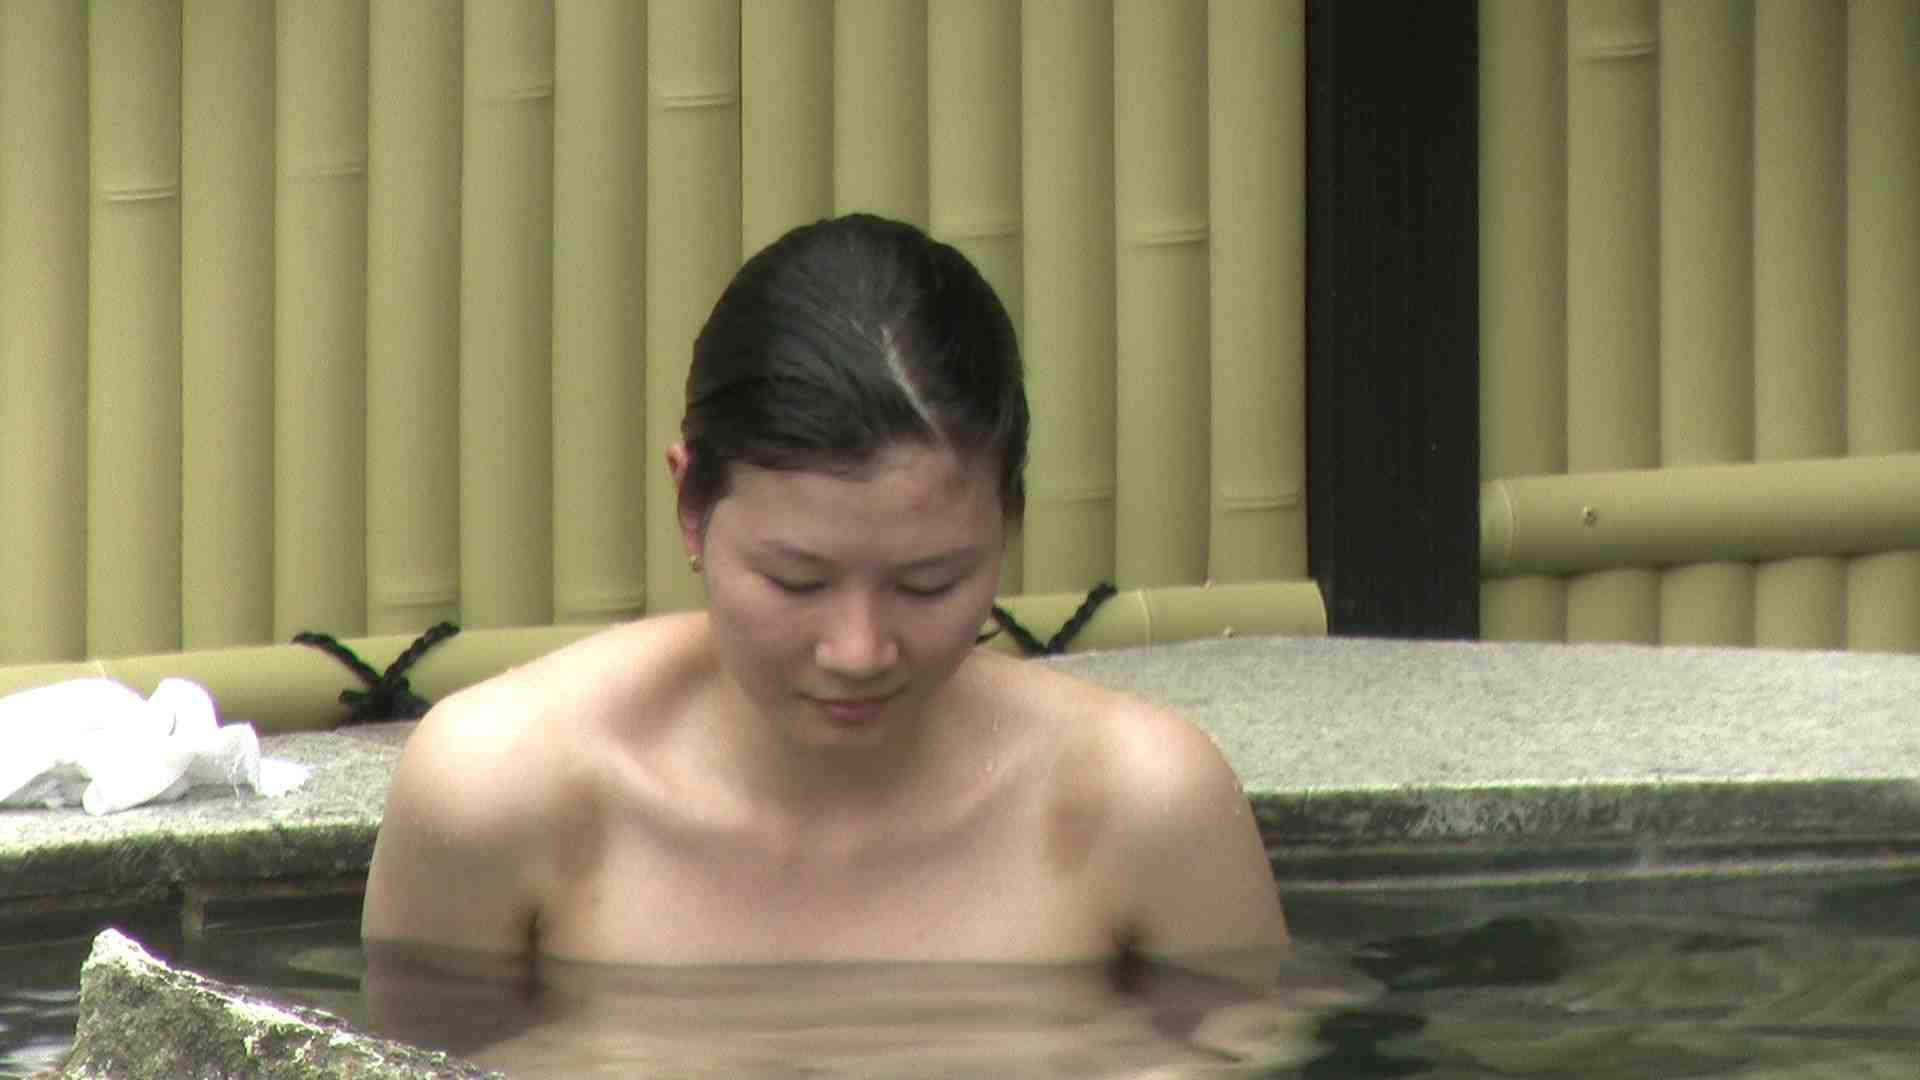 Aquaな露天風呂Vol.187 盗撮映像  99Pix 51